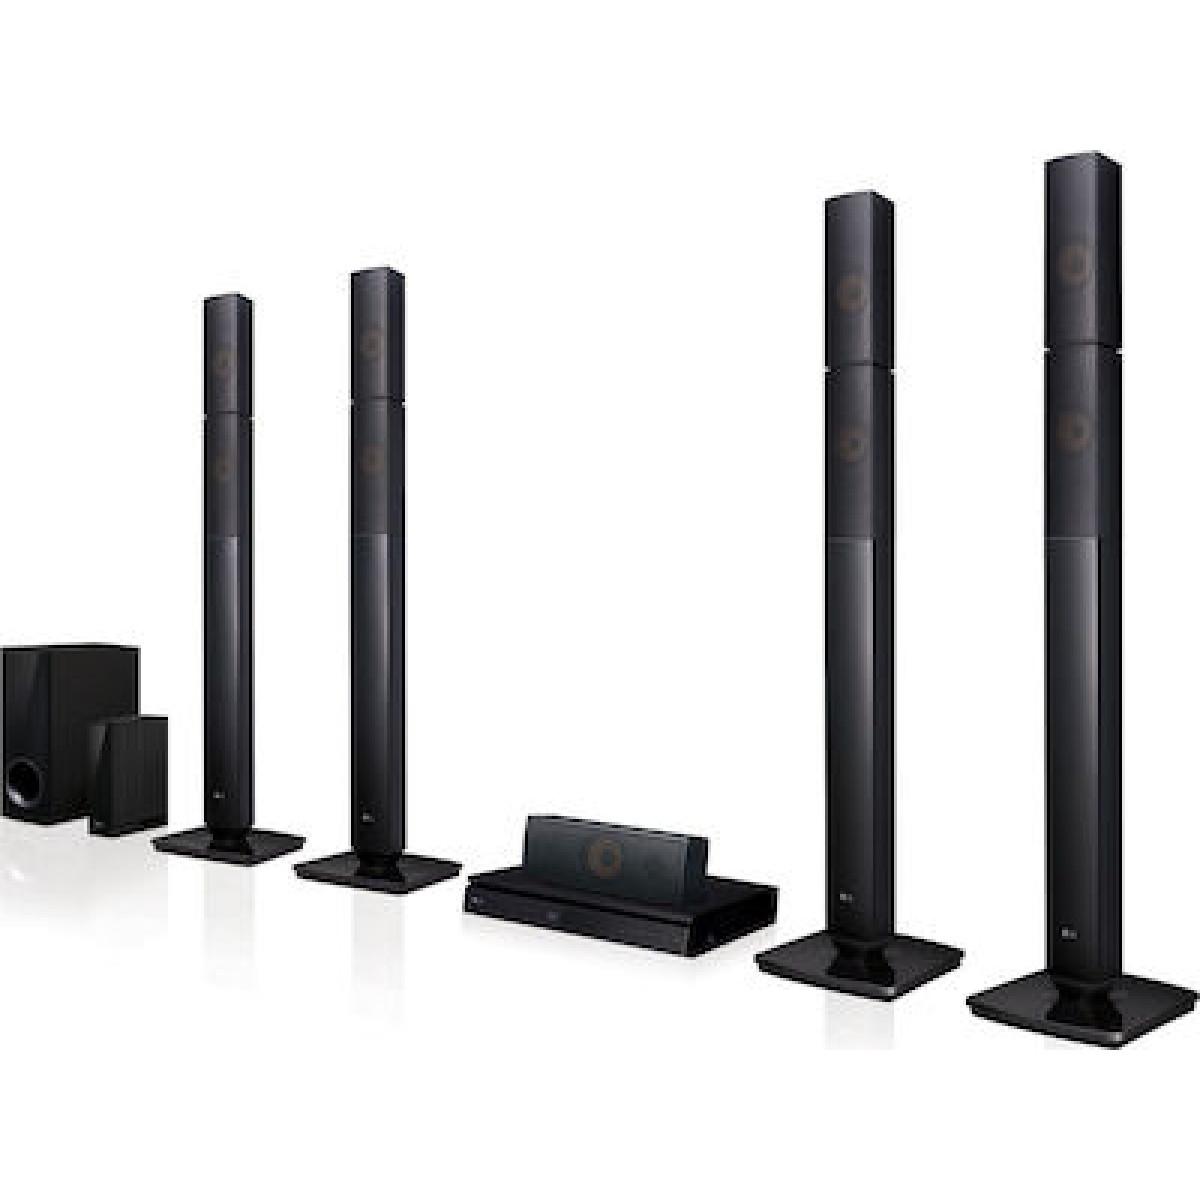 LG Home Cinema LHB655NW Hi - Fi Ηλεκτρικες Συσκευες - homeelectrics.gr